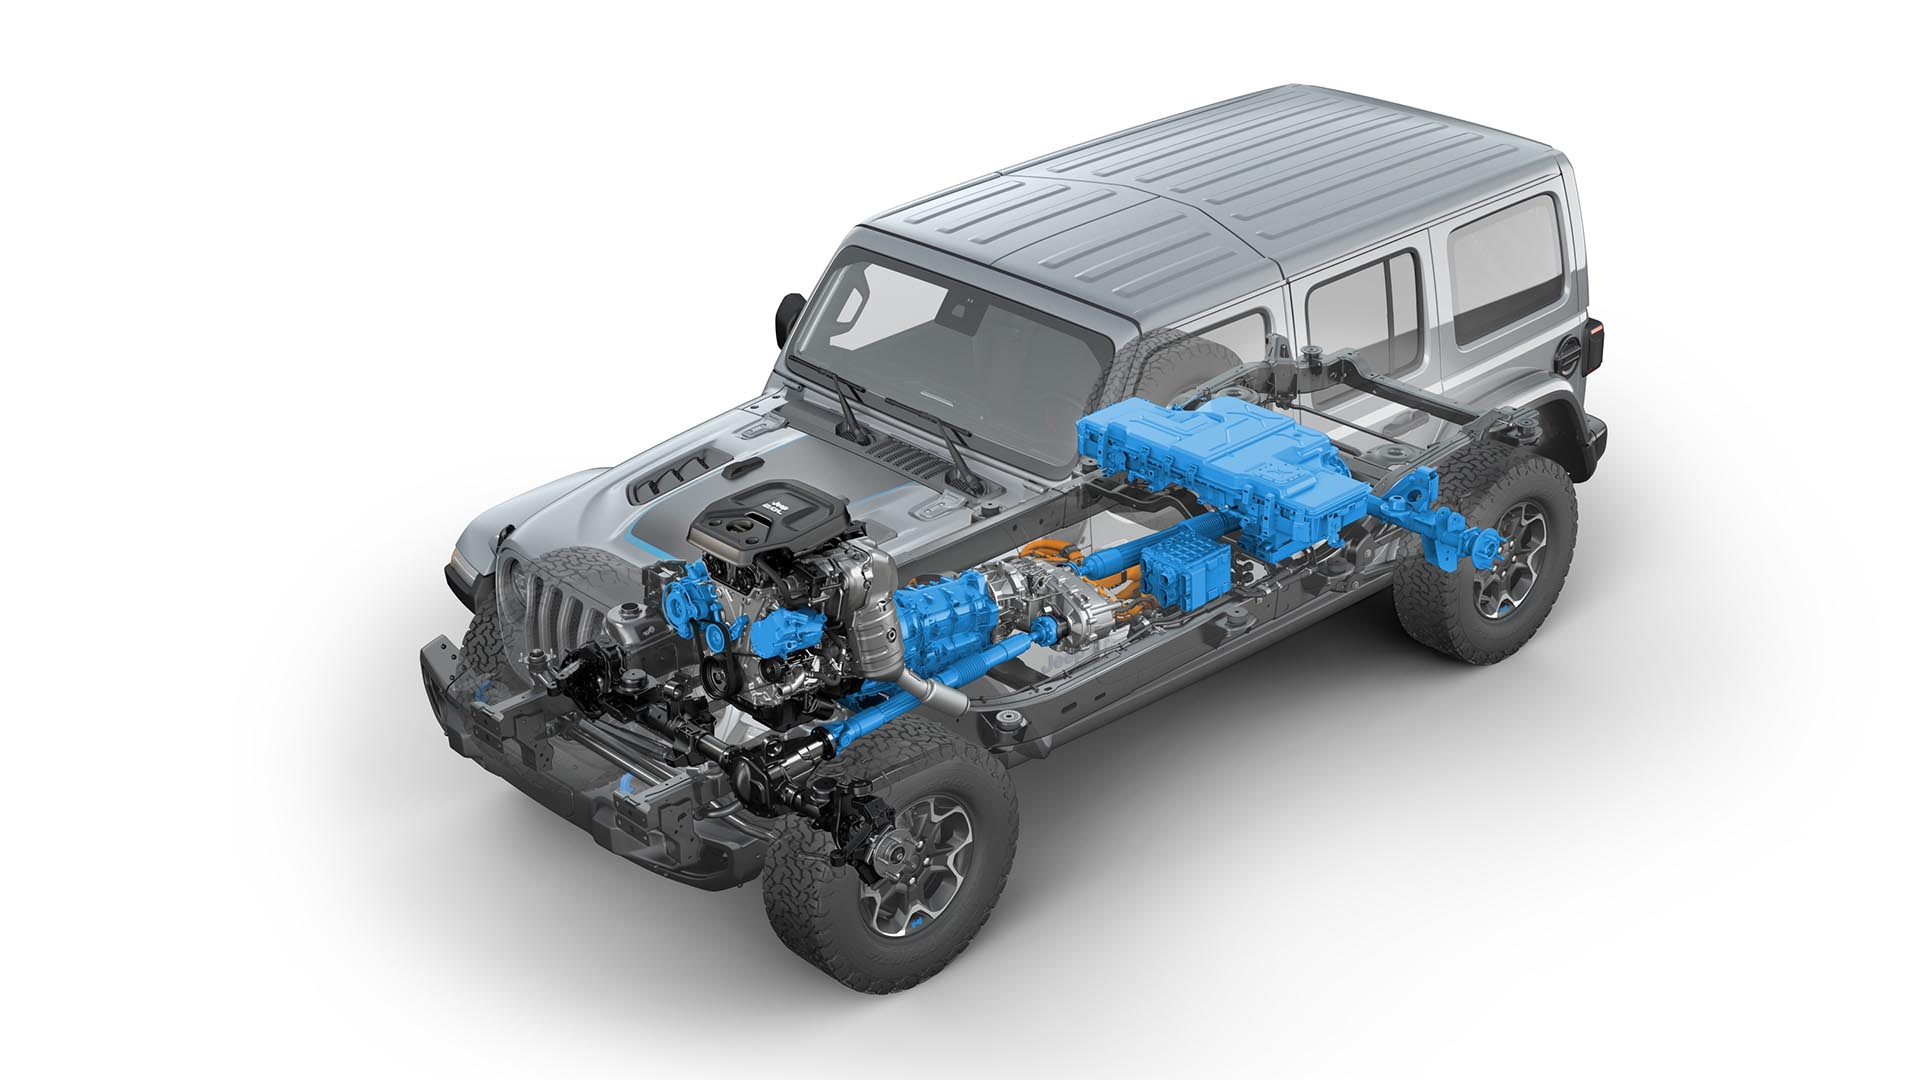 Jeep Wrangler 4xe vs. Land Rover Defender P400e: comparativa técnica